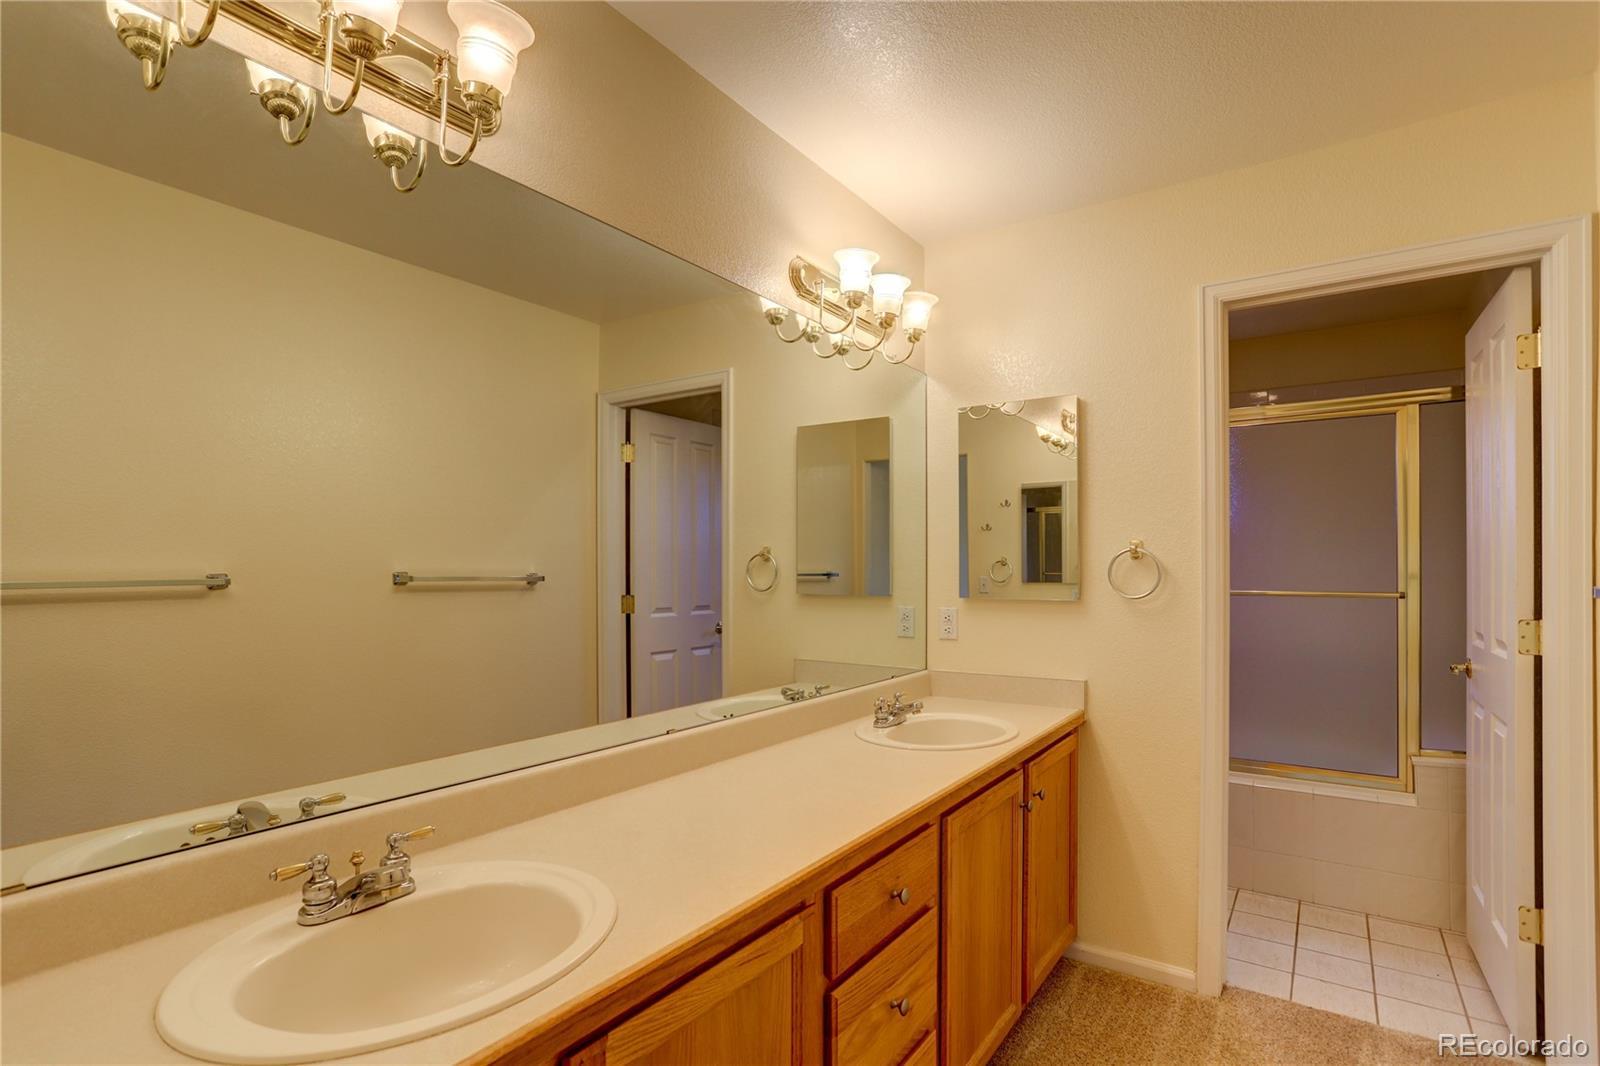 MLS# 2836182 - 28 - 7700 W Grant Ranch Boulevard #10D, Littleton, CO 80123